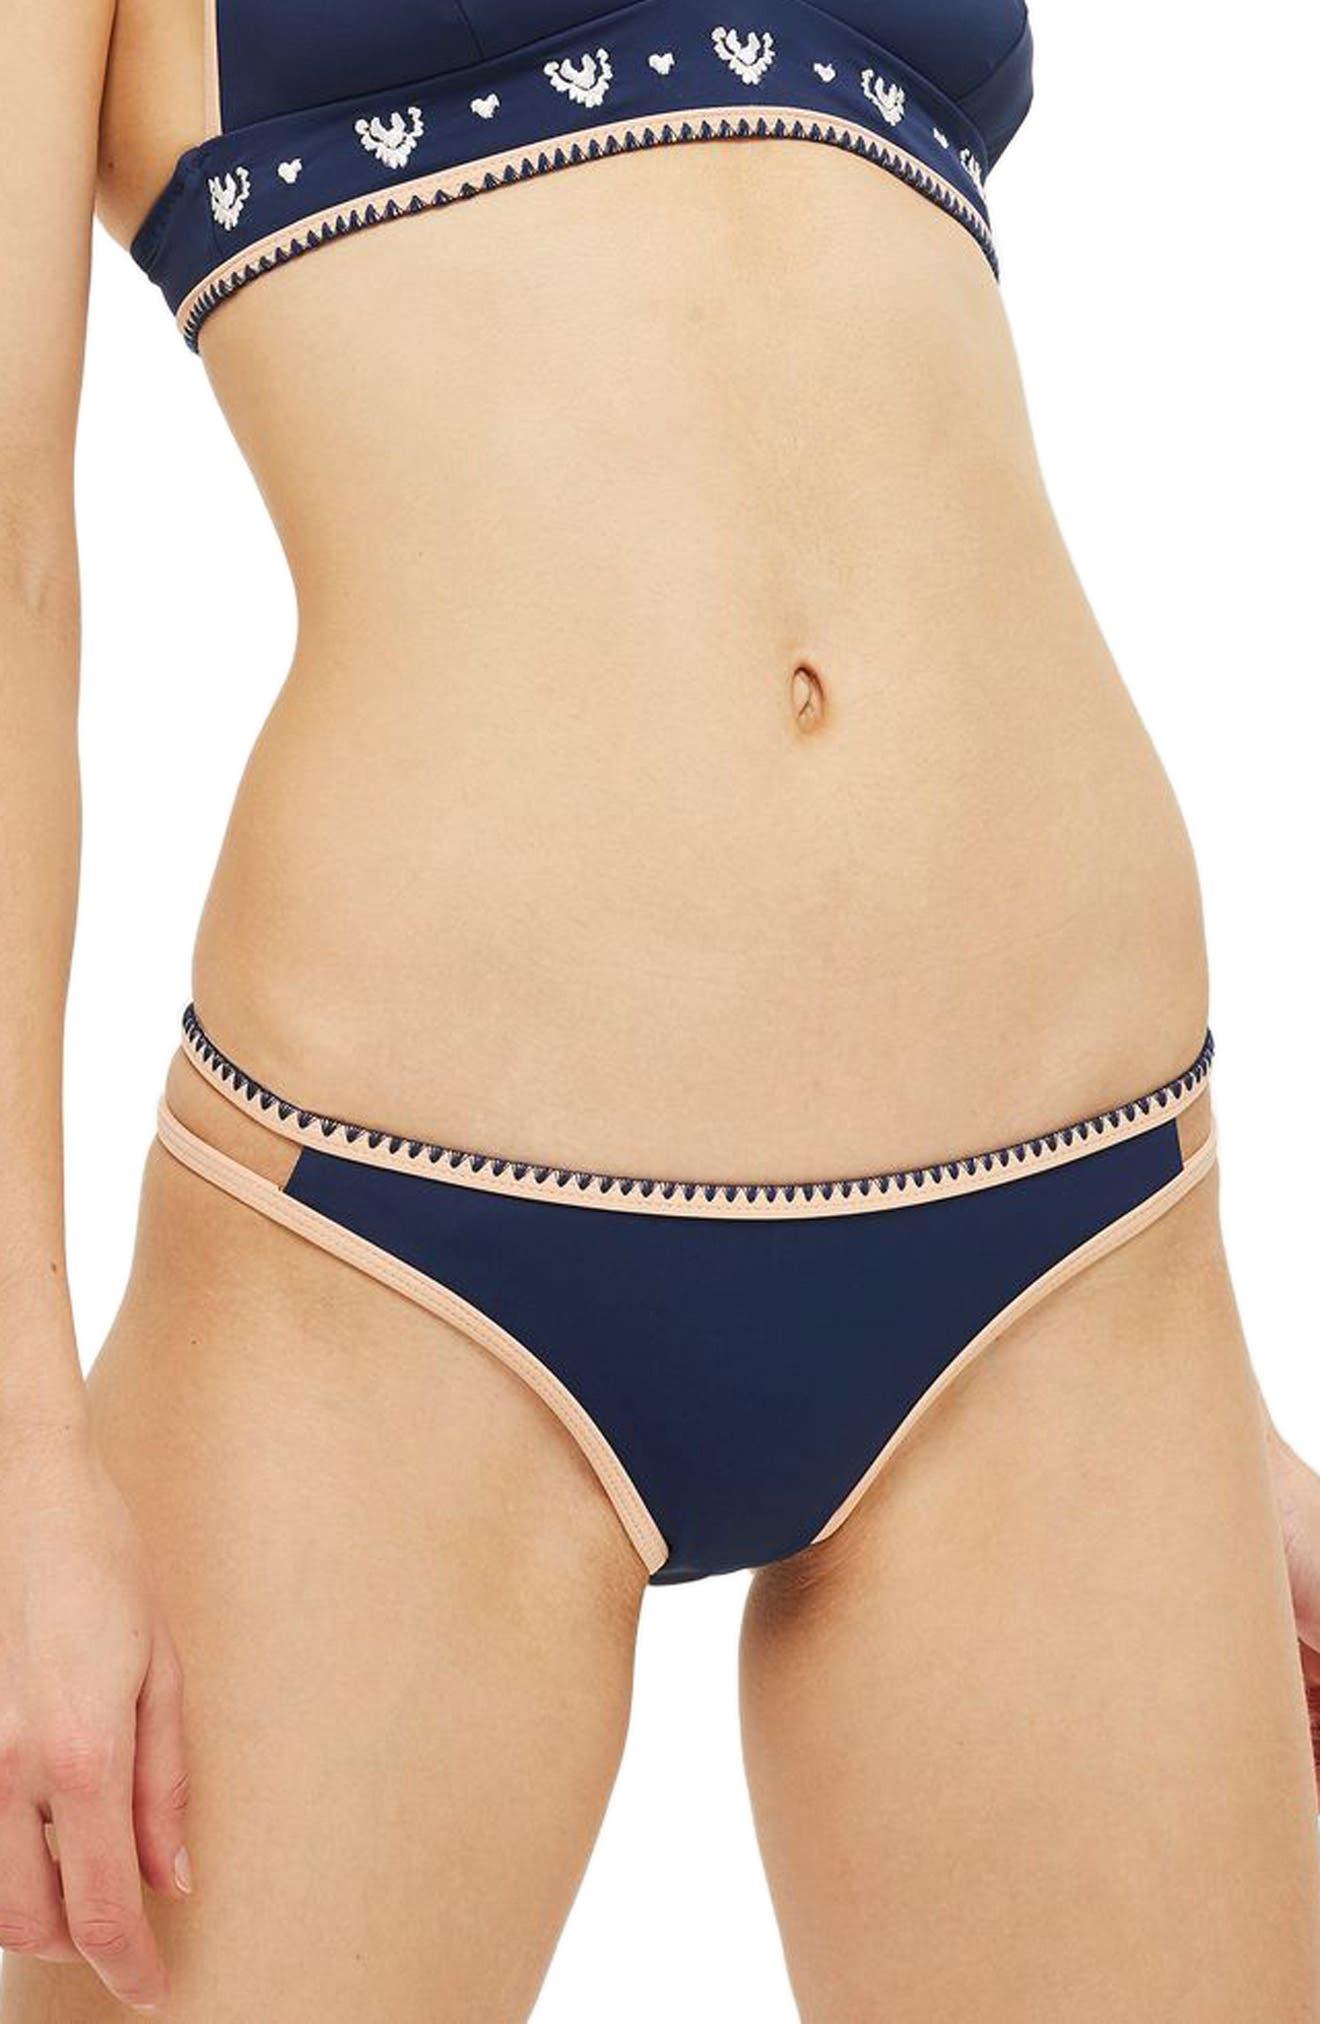 Topshop Stitched Edge Bikini Bottoms